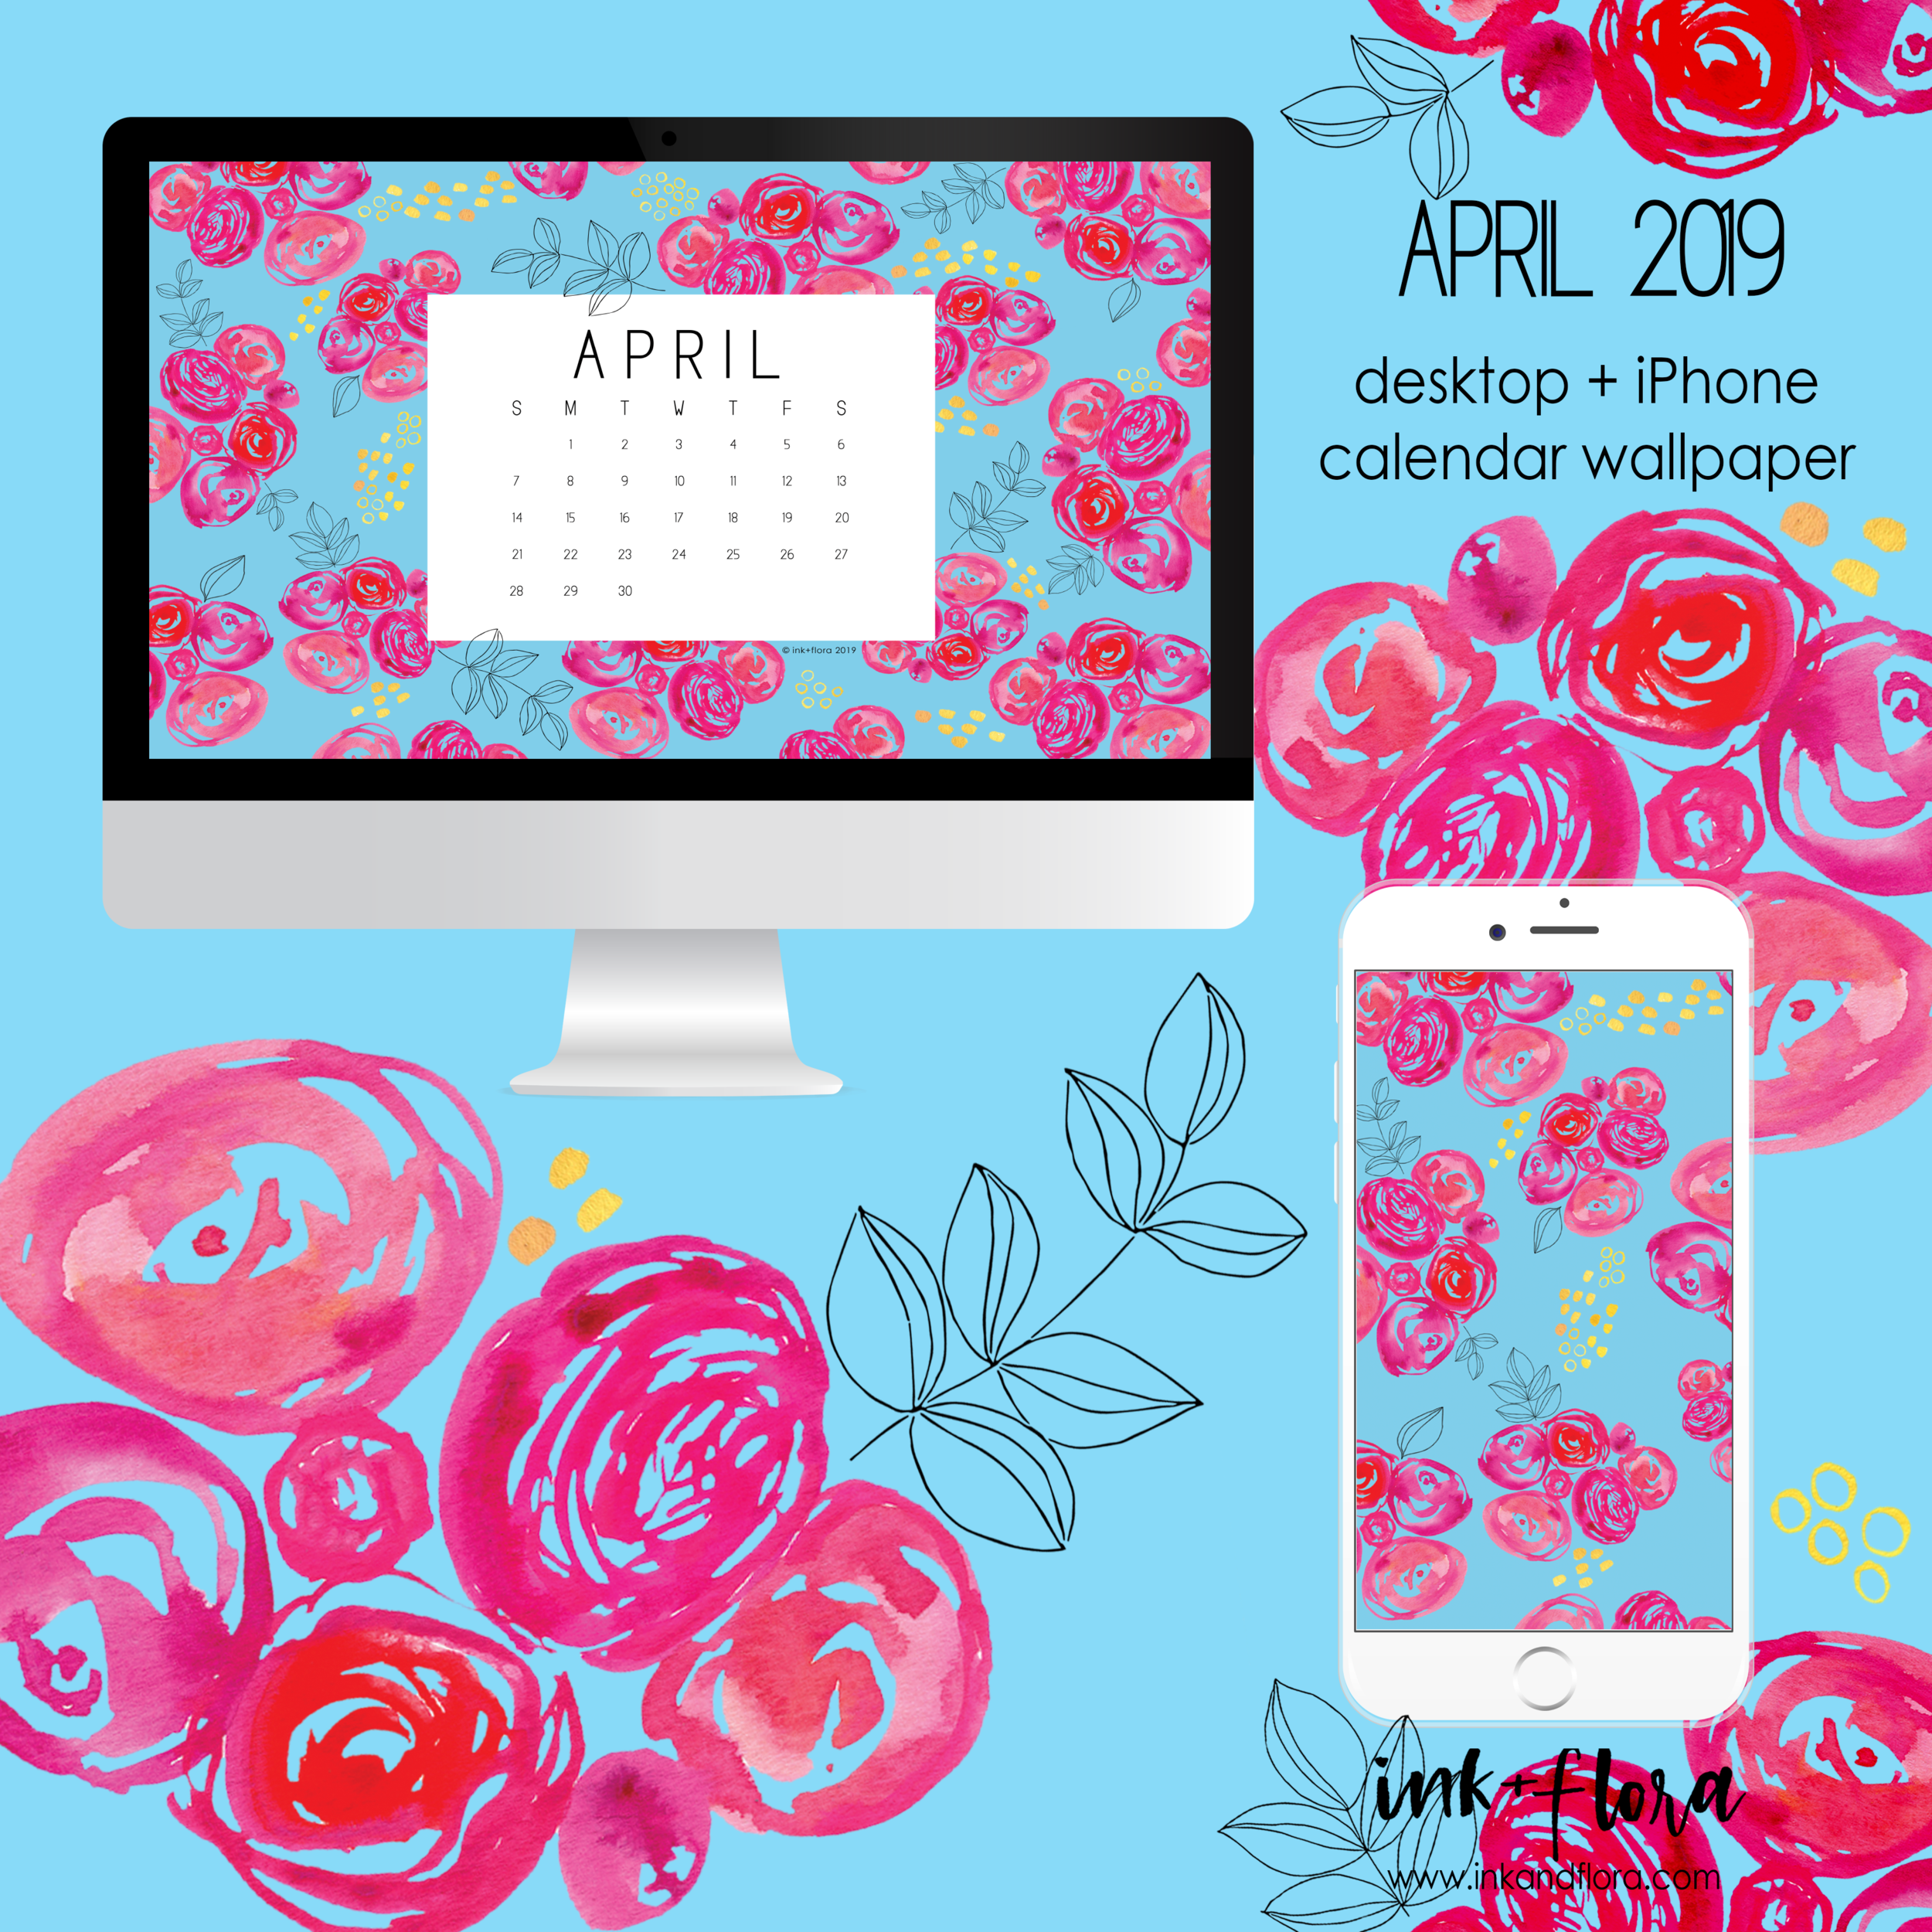 spring desktop calendar wallpaper